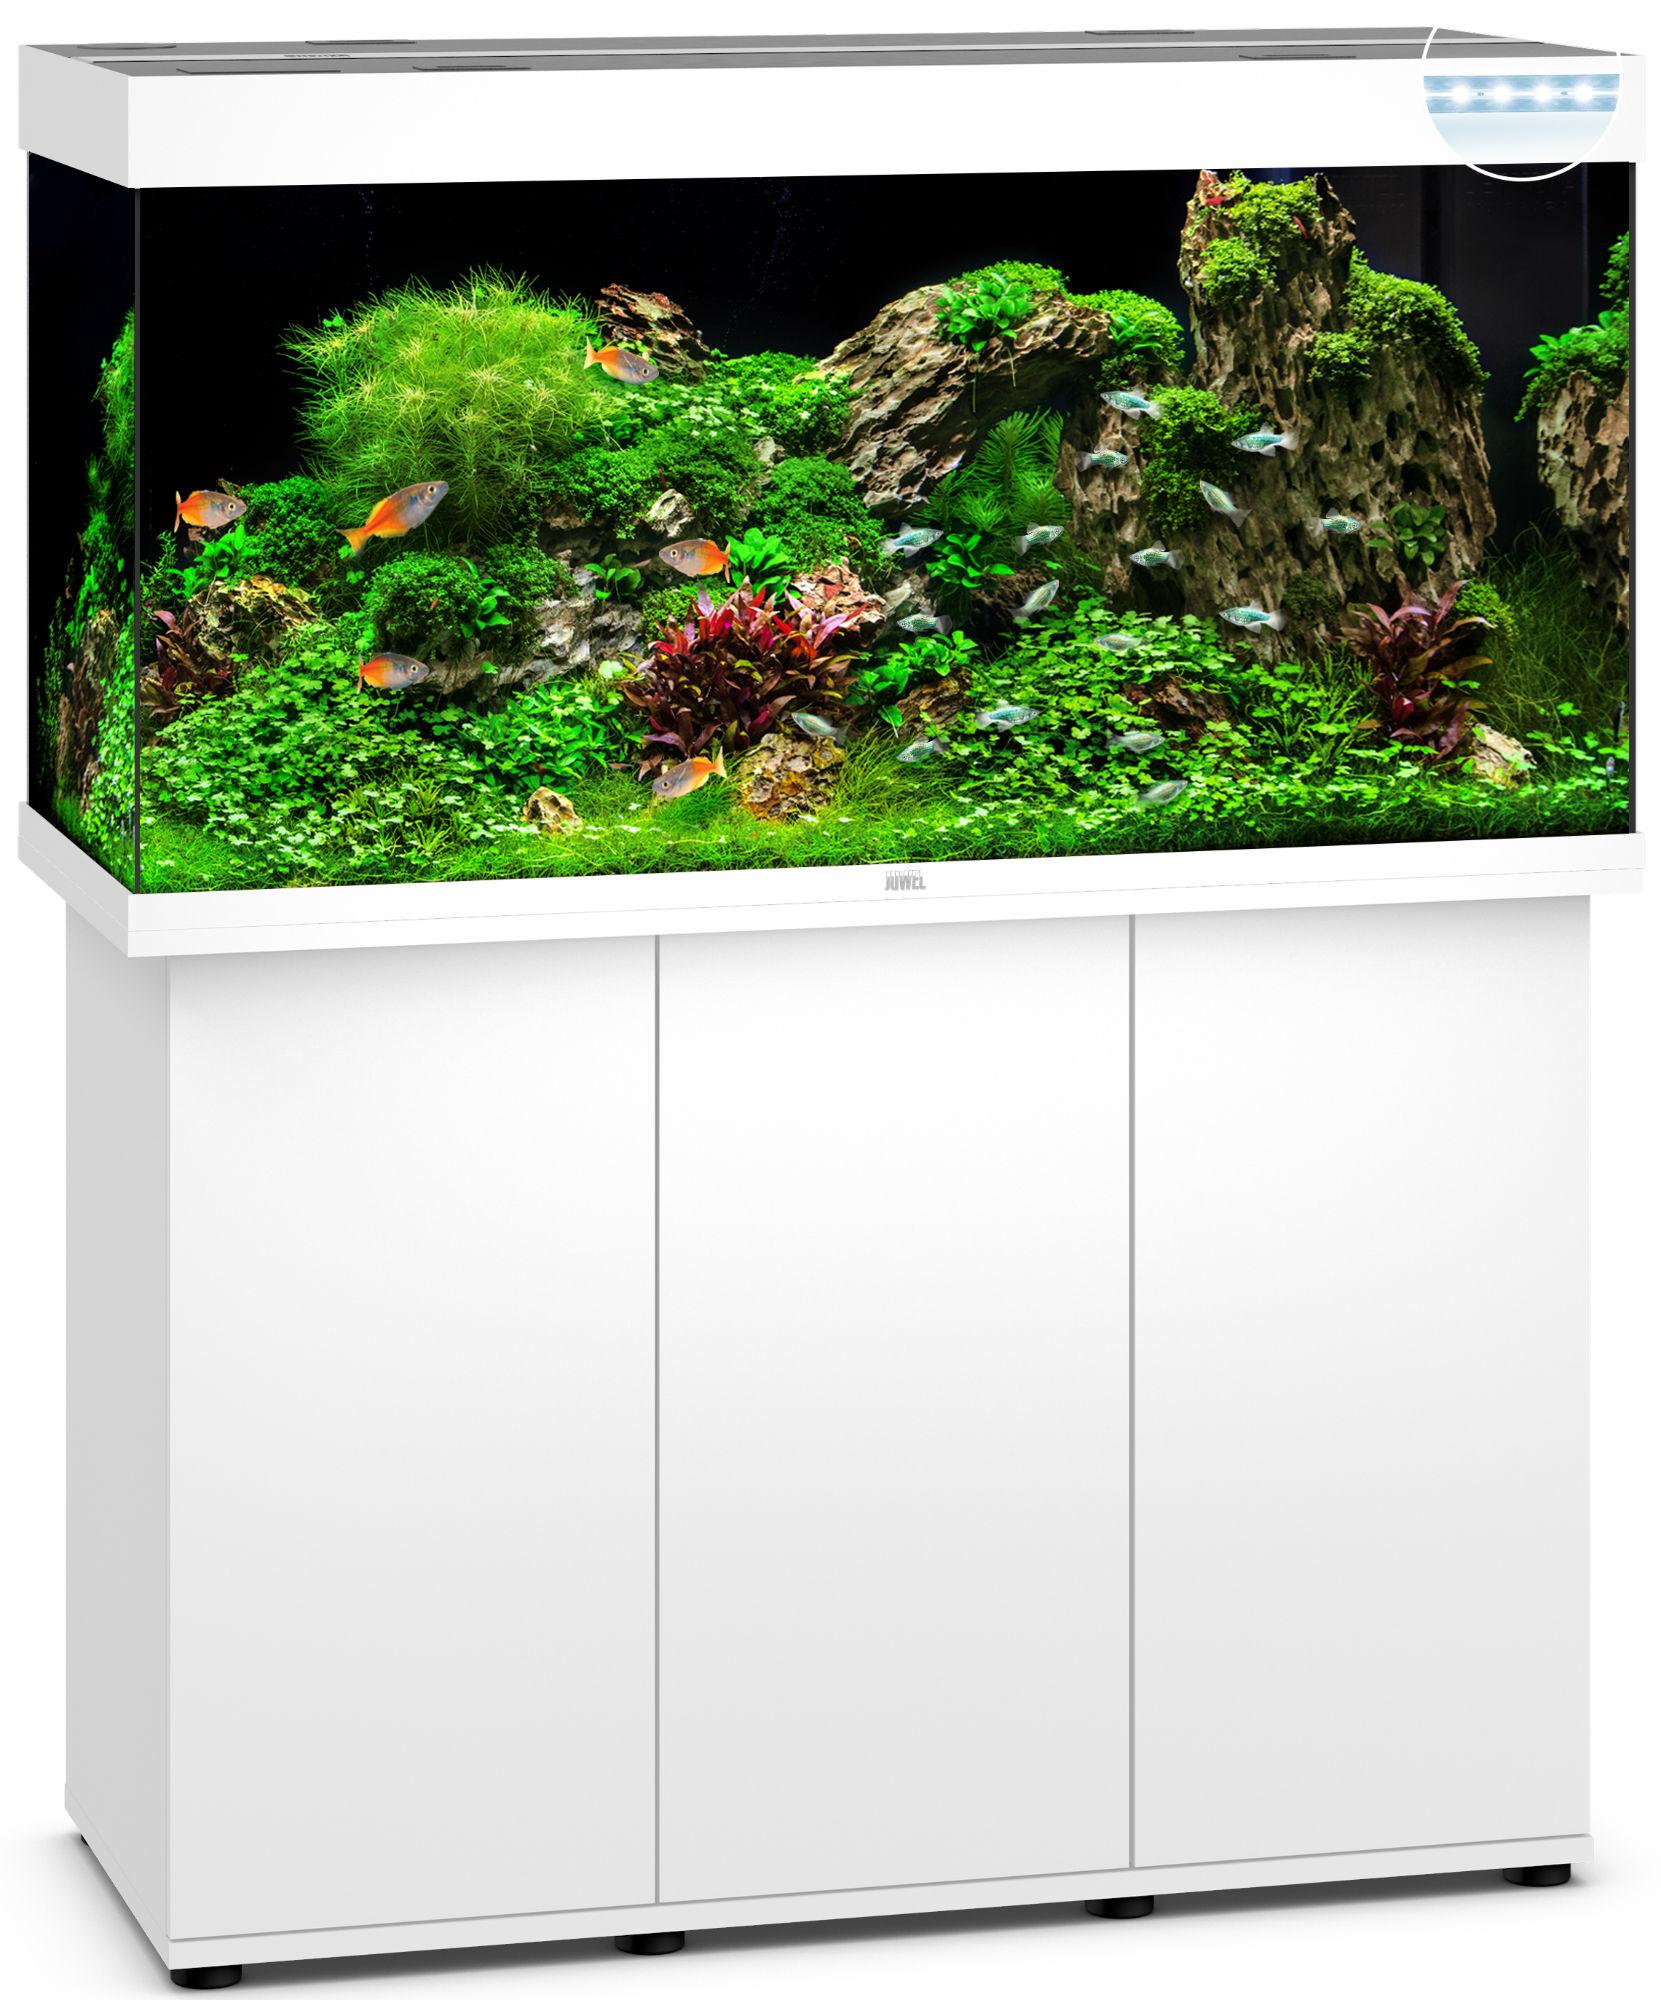 juwel rio 350 led aquarium mit unterschrank ebay. Black Bedroom Furniture Sets. Home Design Ideas